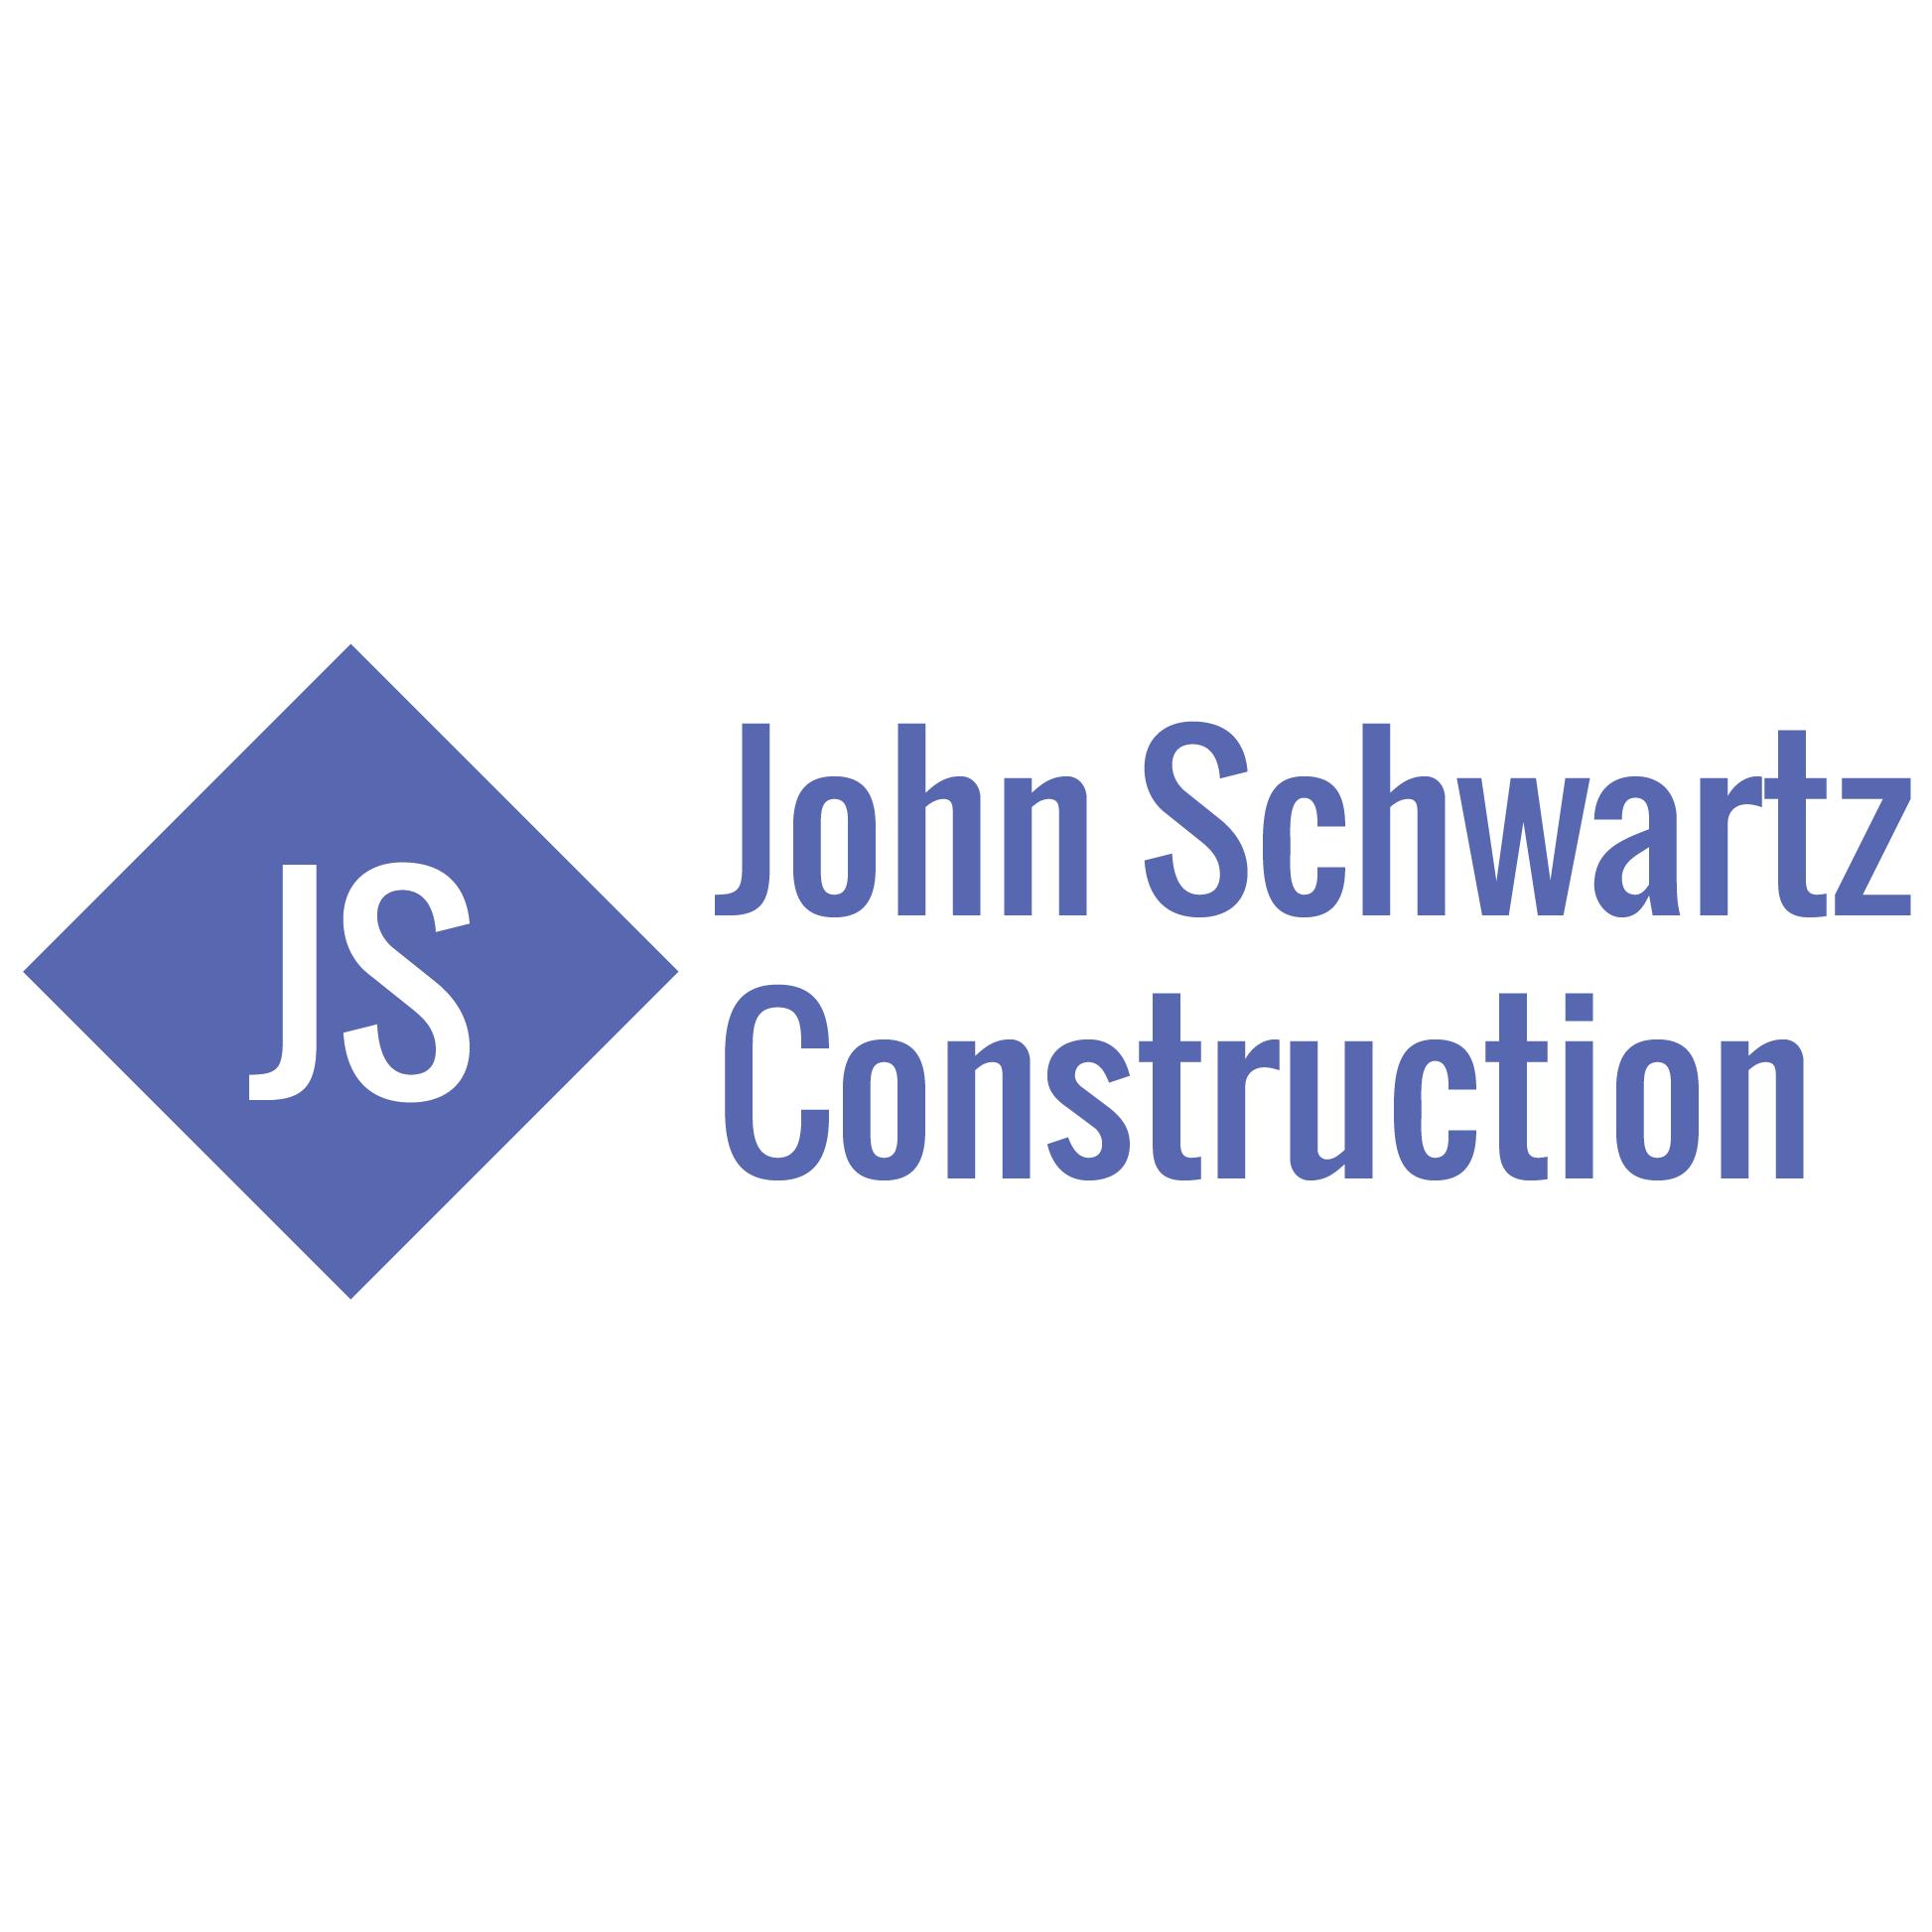 John Schwartz Construction